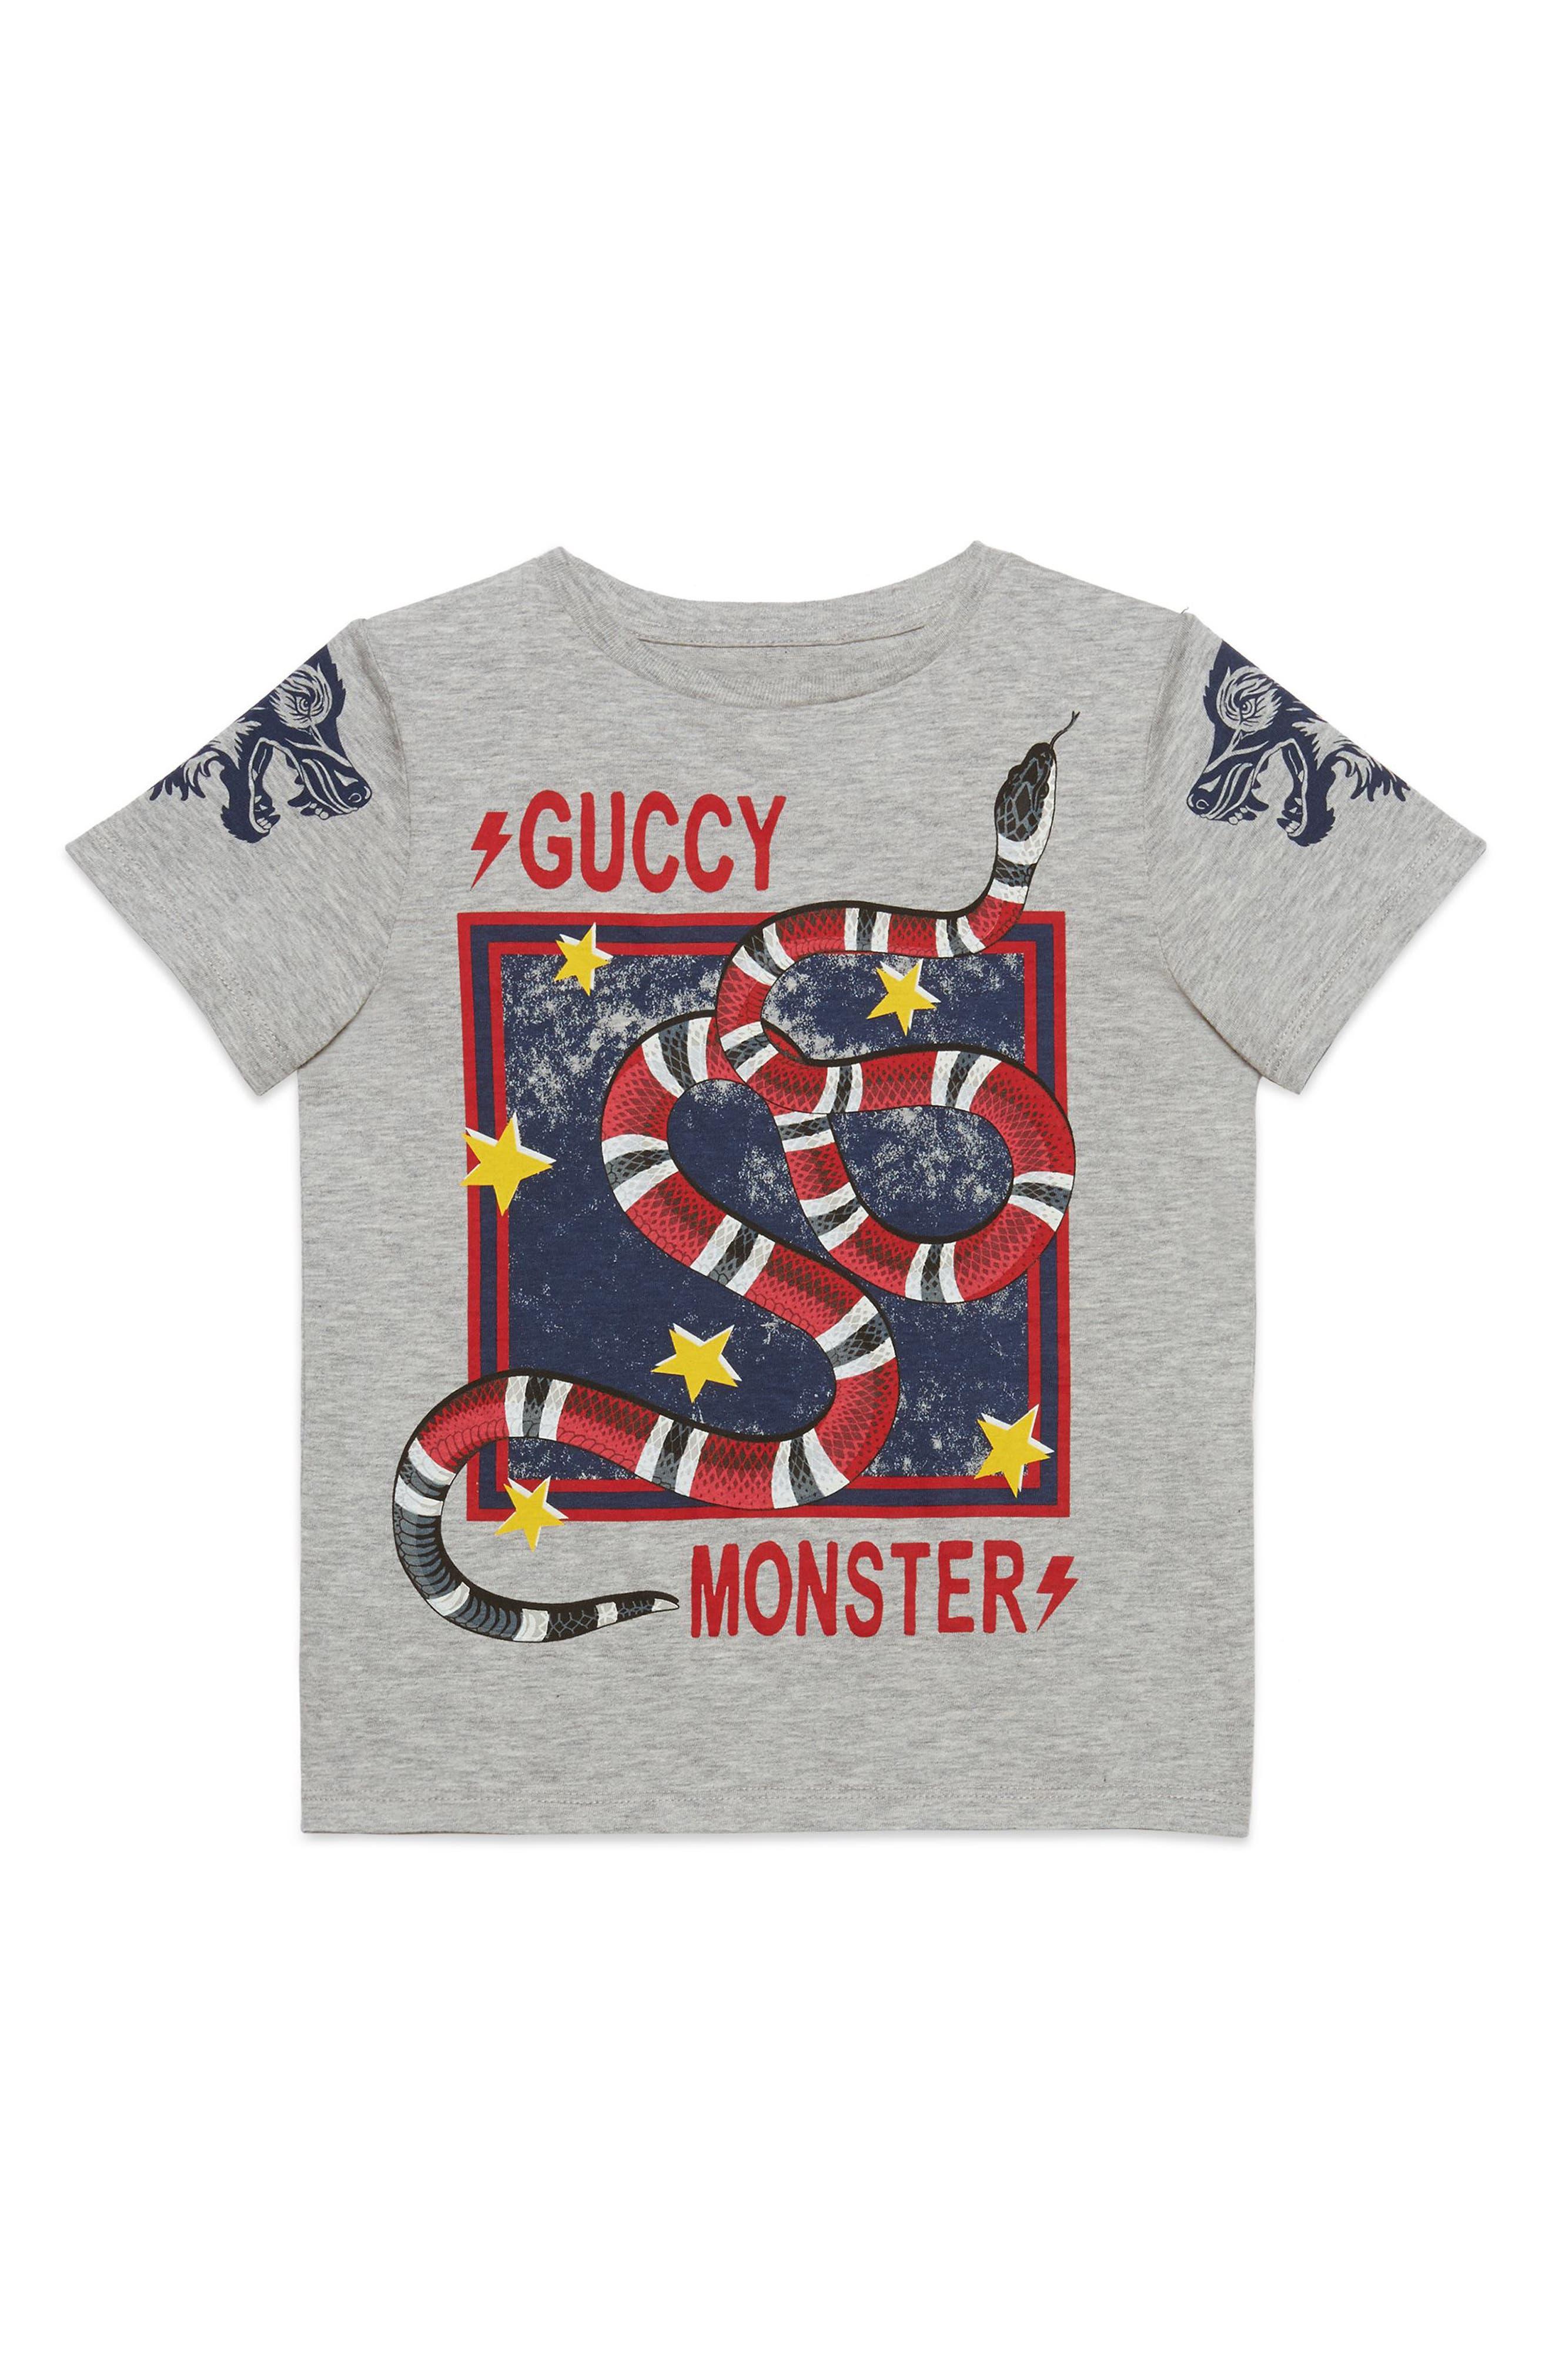 Guccy Monster & King Snake Graphic T-Shirt,                             Main thumbnail 1, color,                             L.GREY MEL B/ R/ B